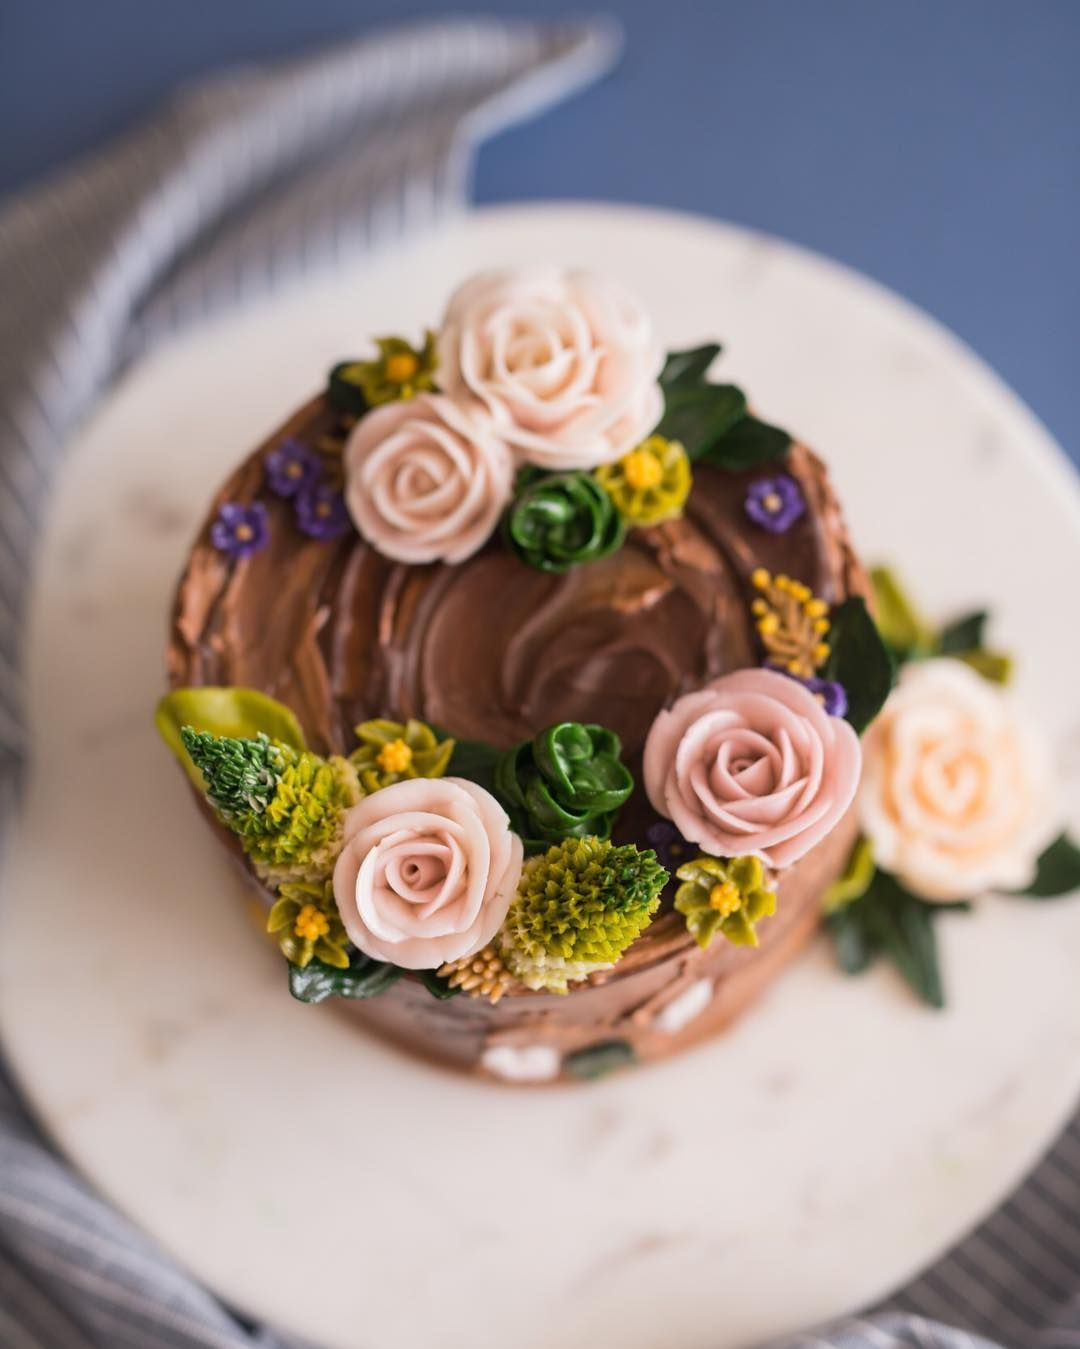 natural buttercream flowercake 에스프레소케이크&캐러멜버터크림 . Lewis flower cake. . . . . . . #루이스케이크 #이단케이크 #웨딩케이크 #플라워케이크 #플라워케이크클래스 #버터크림 #버터크림케이크 #꽃케이크 #꽃 #꽃스타그램 #케익스타그램 #맛스타그램 #먹스타그램 #베이킹 #홈베이킹 #floral #flowers #flowercake #flowerstagram #instadaily #instagood #instalike #baker #cake #cupcakes #wiltoncake #weddingcake #花ケーキ #生日蛋糕 #koreaflowercake